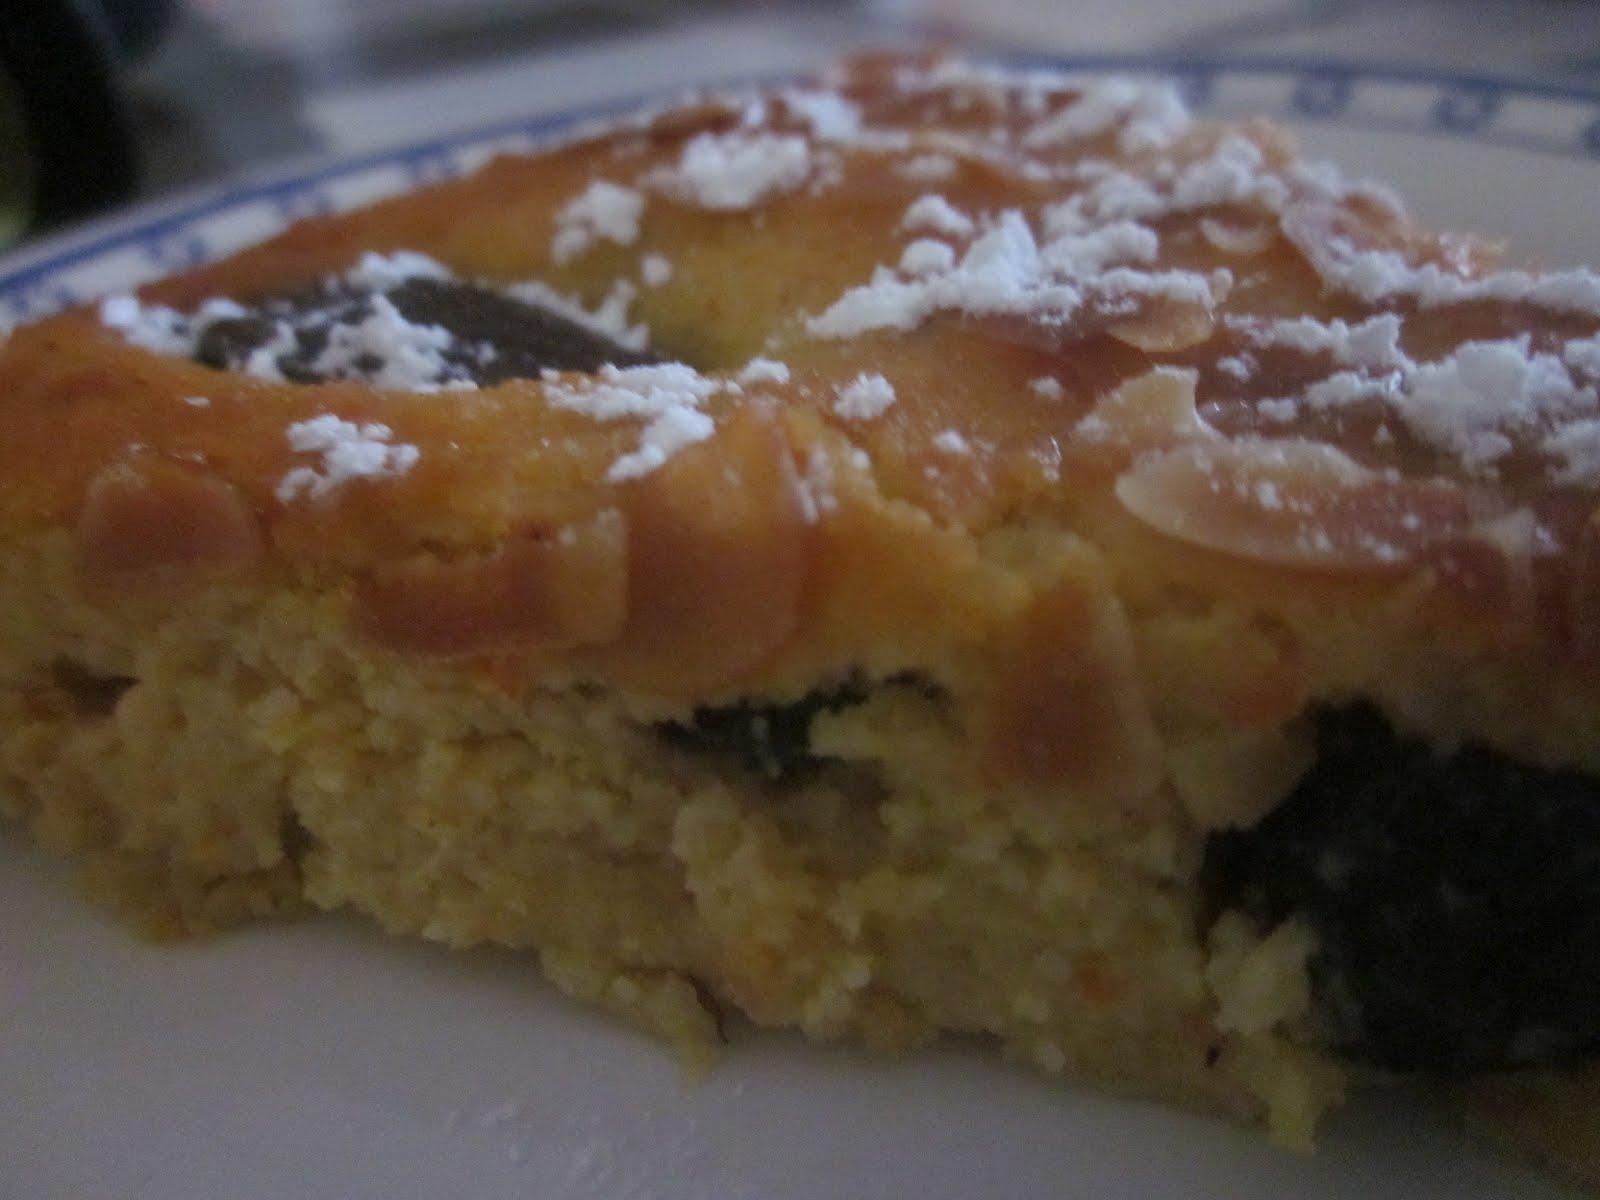 Cocina y hornea: Tarta de benidorm a mi estilo